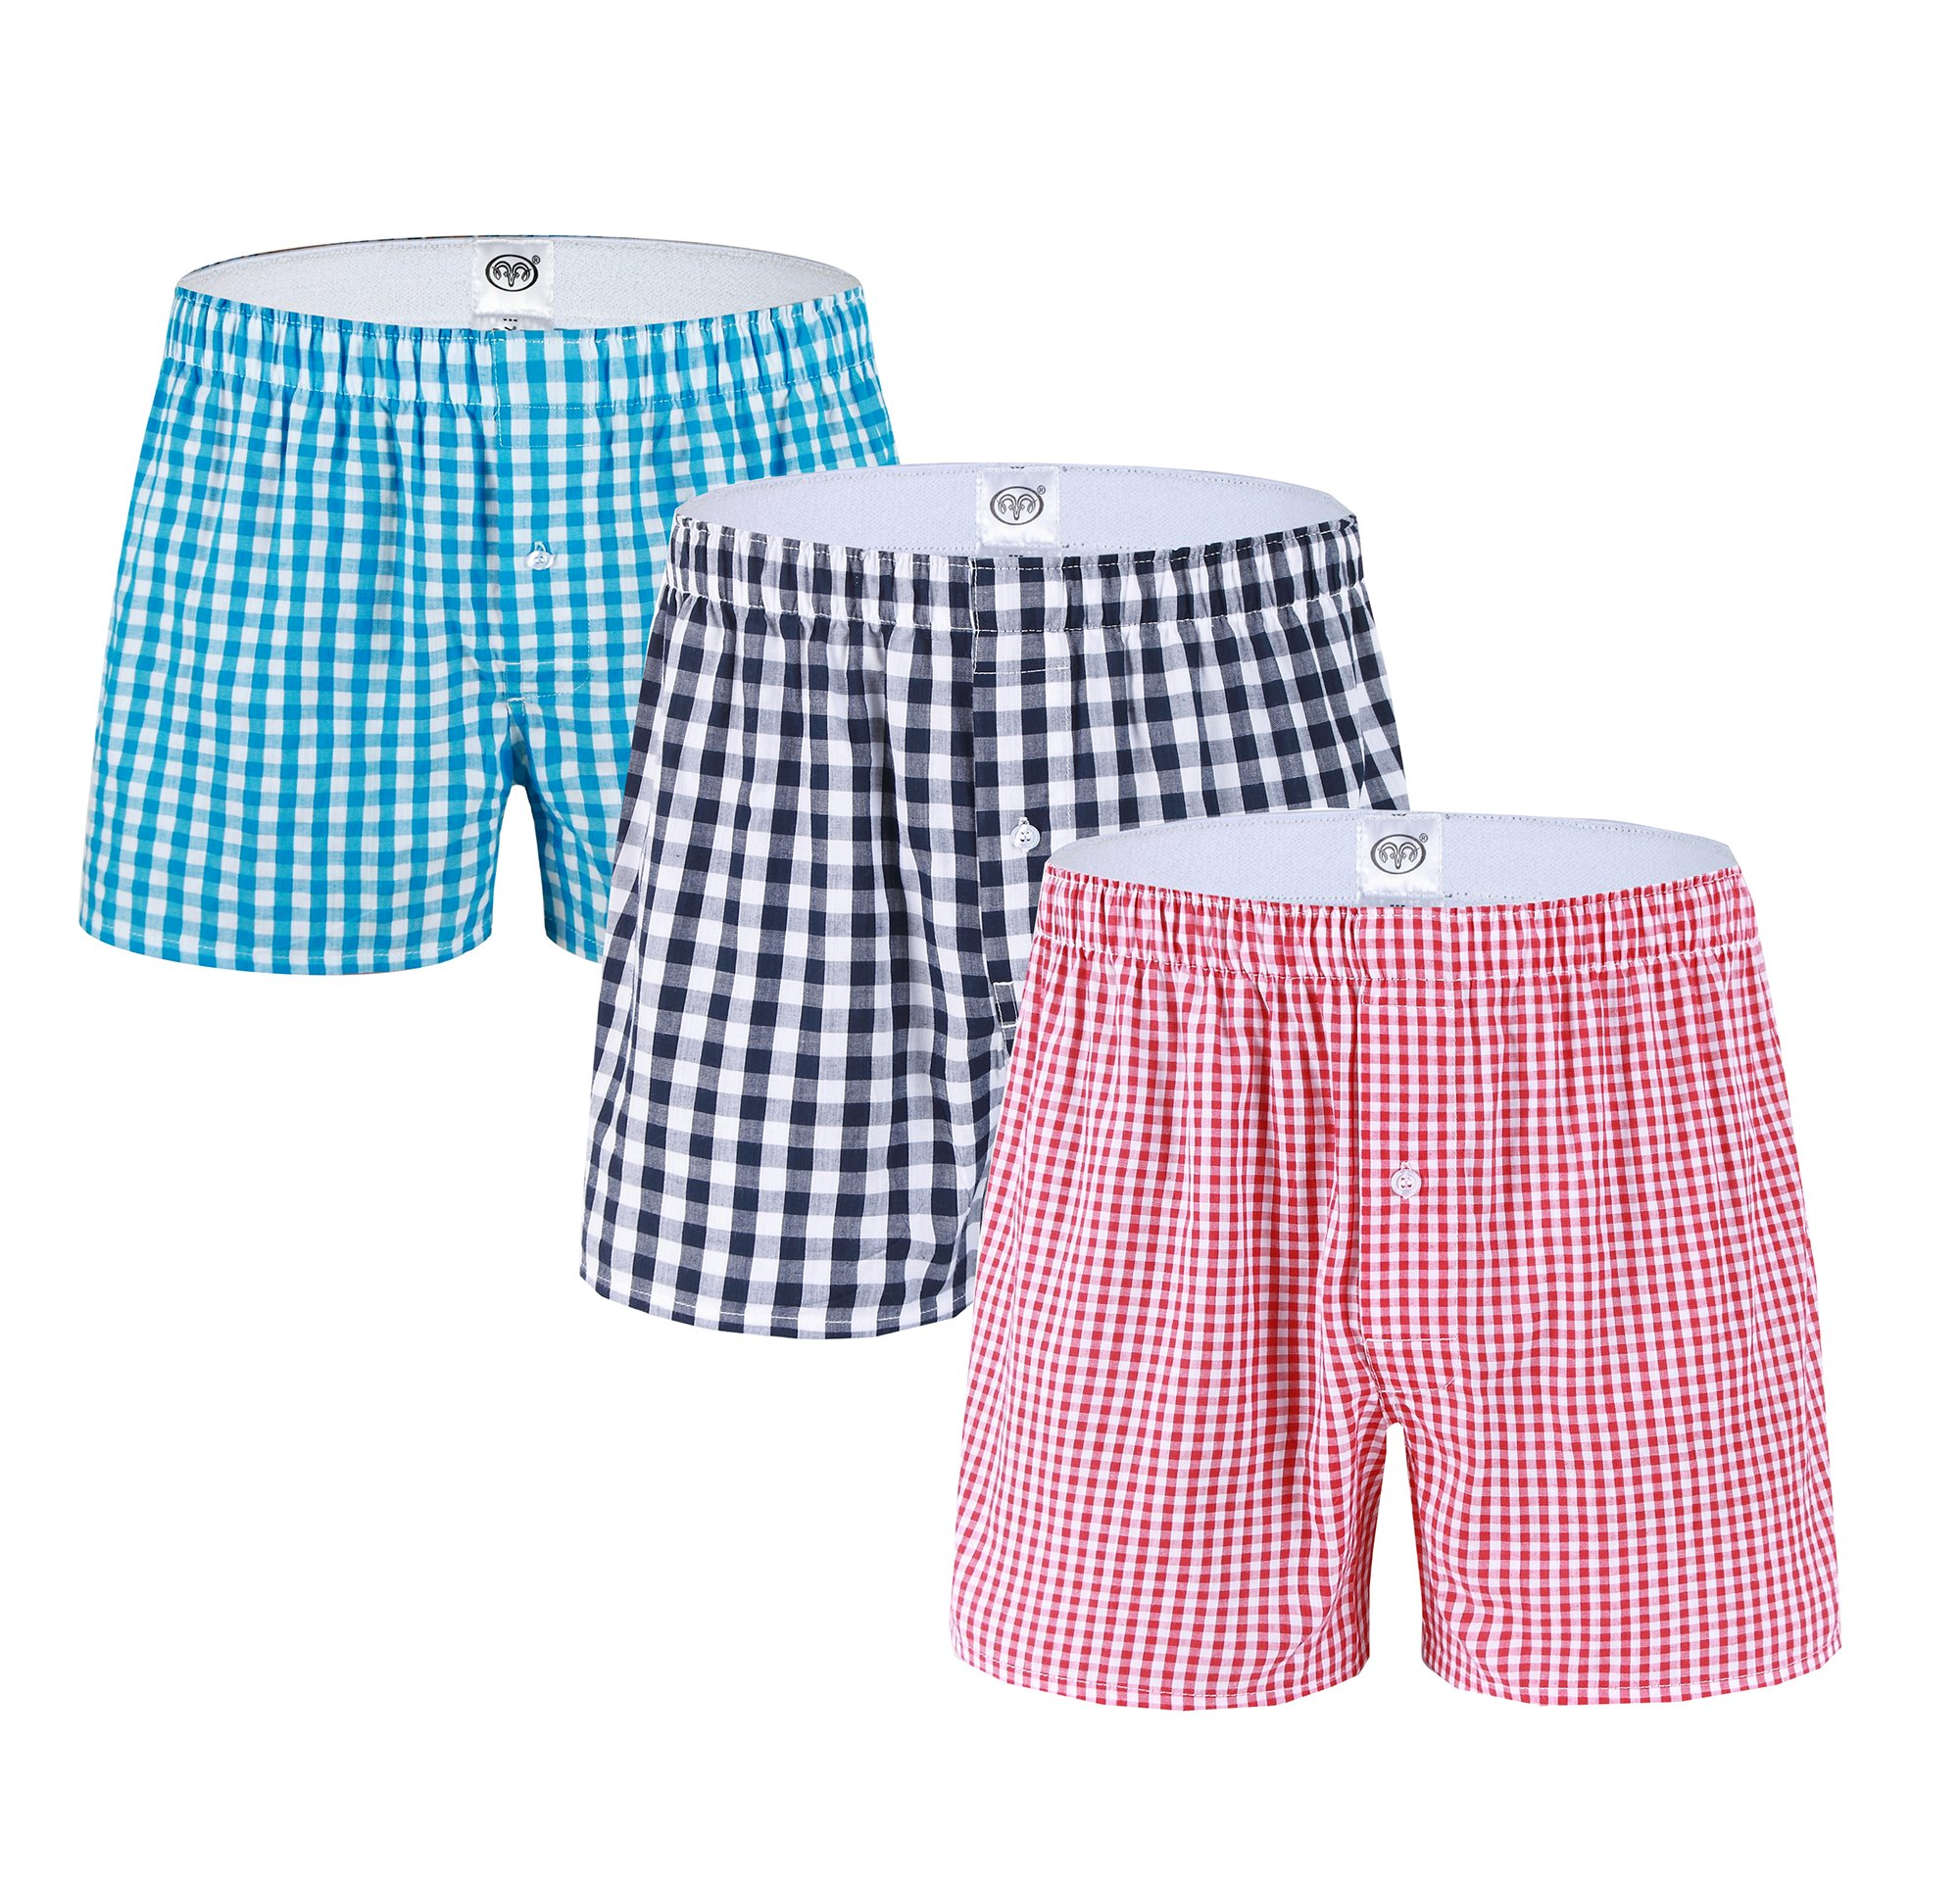 DD.UP Men's Summer Loose Stripe Underwear 3 Pack Cotton Classics Woven Shorts Boxer